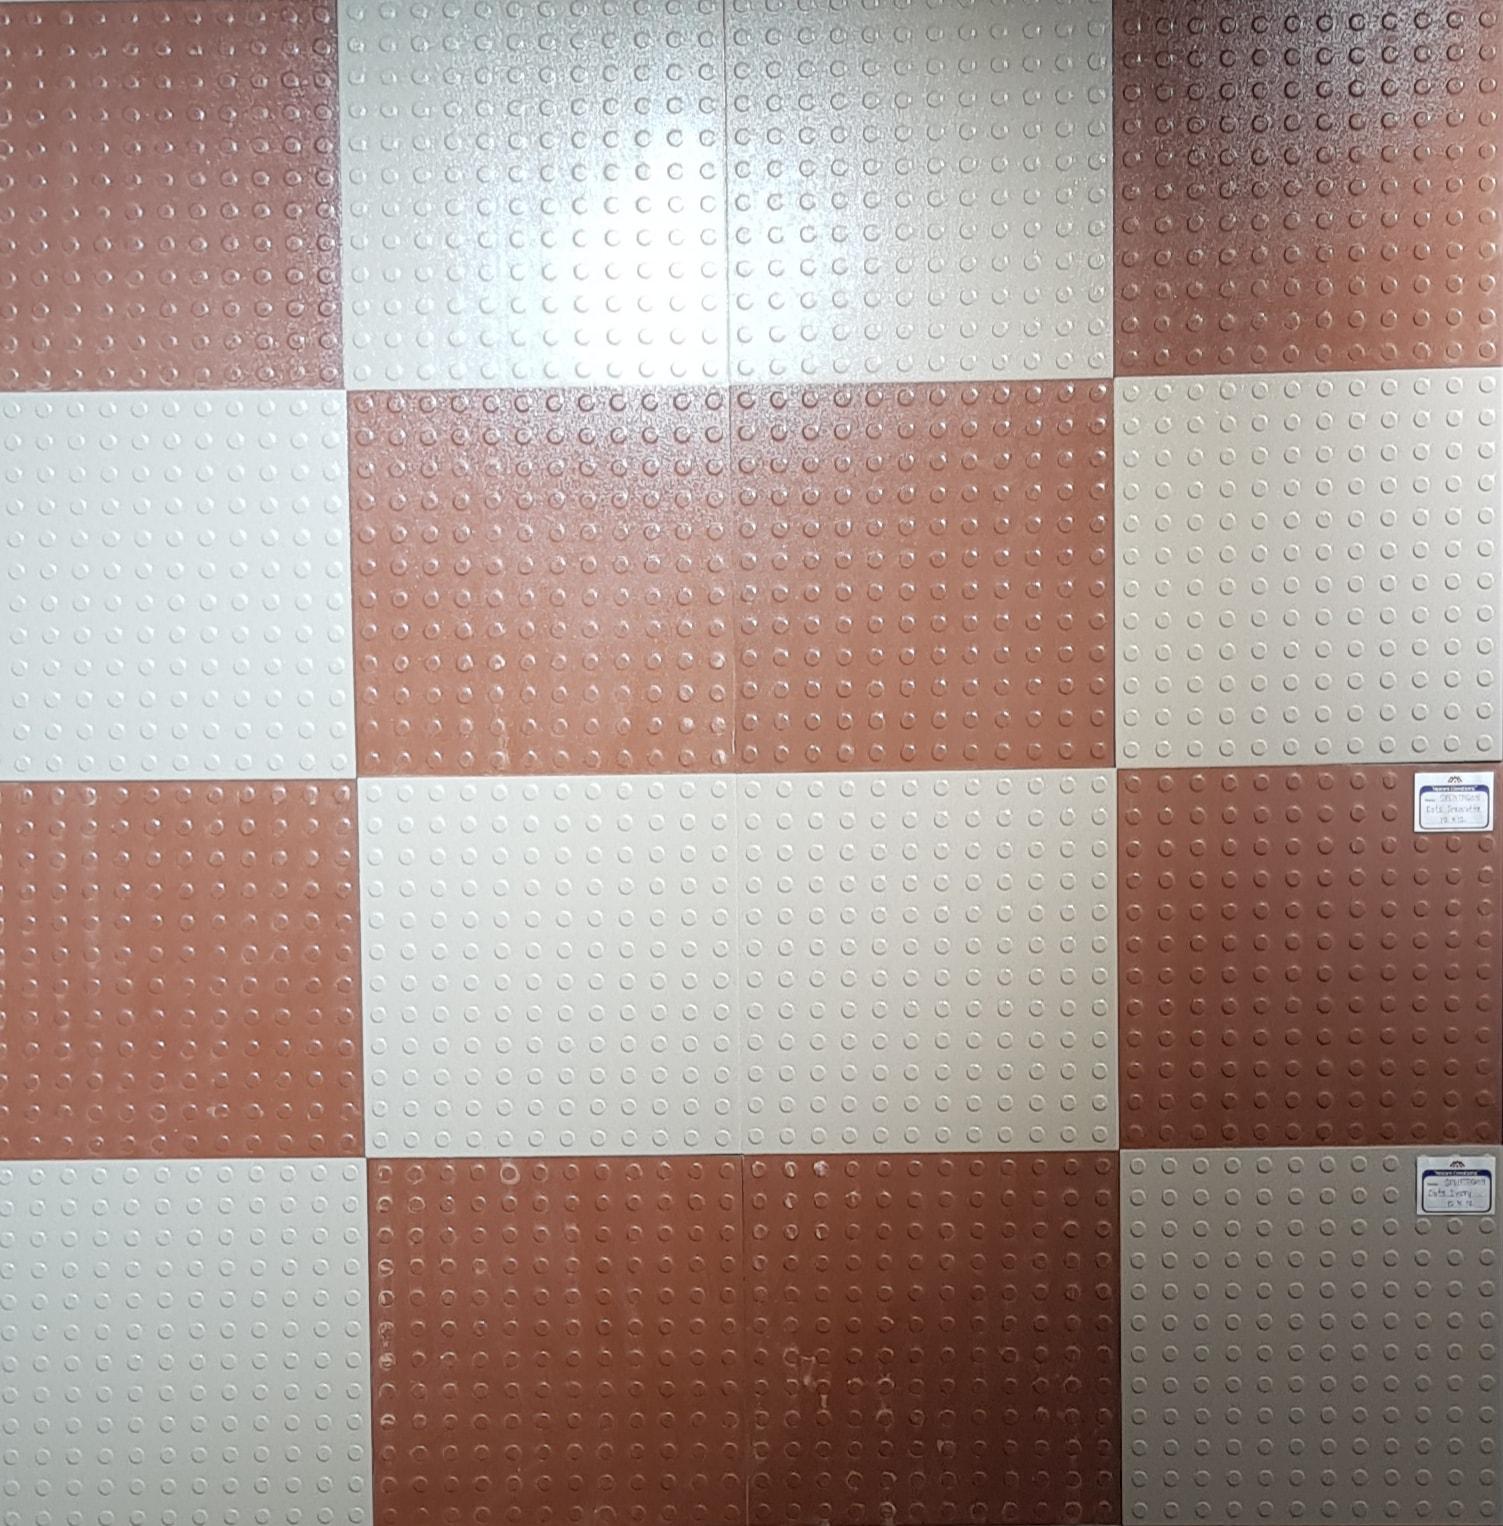 12 x 12 parking tiles spentagon dots